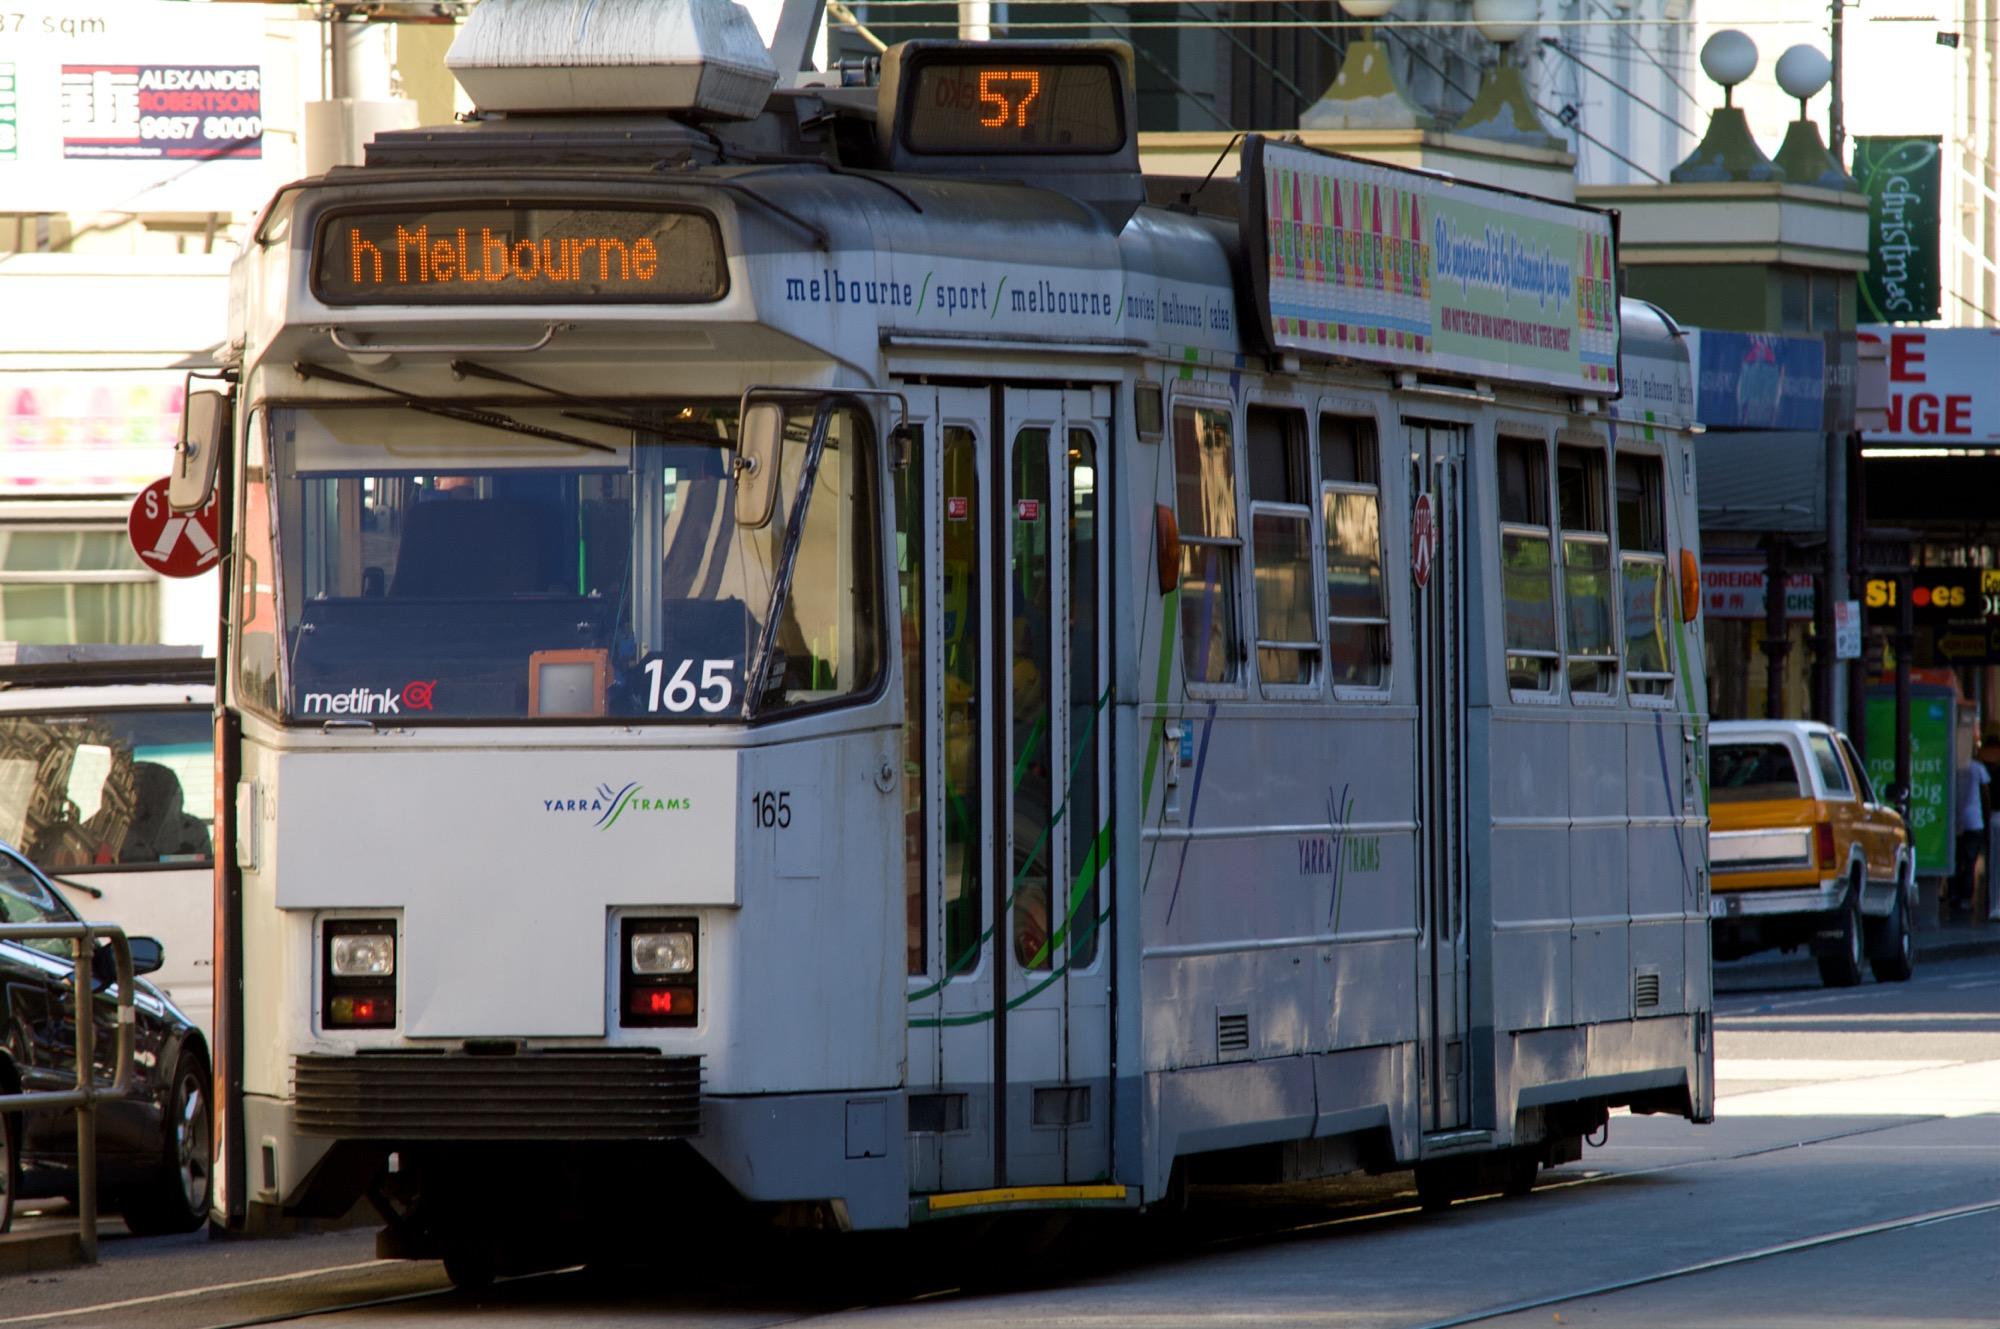 Melbourne stuff - 1 of 223 (180).jpg